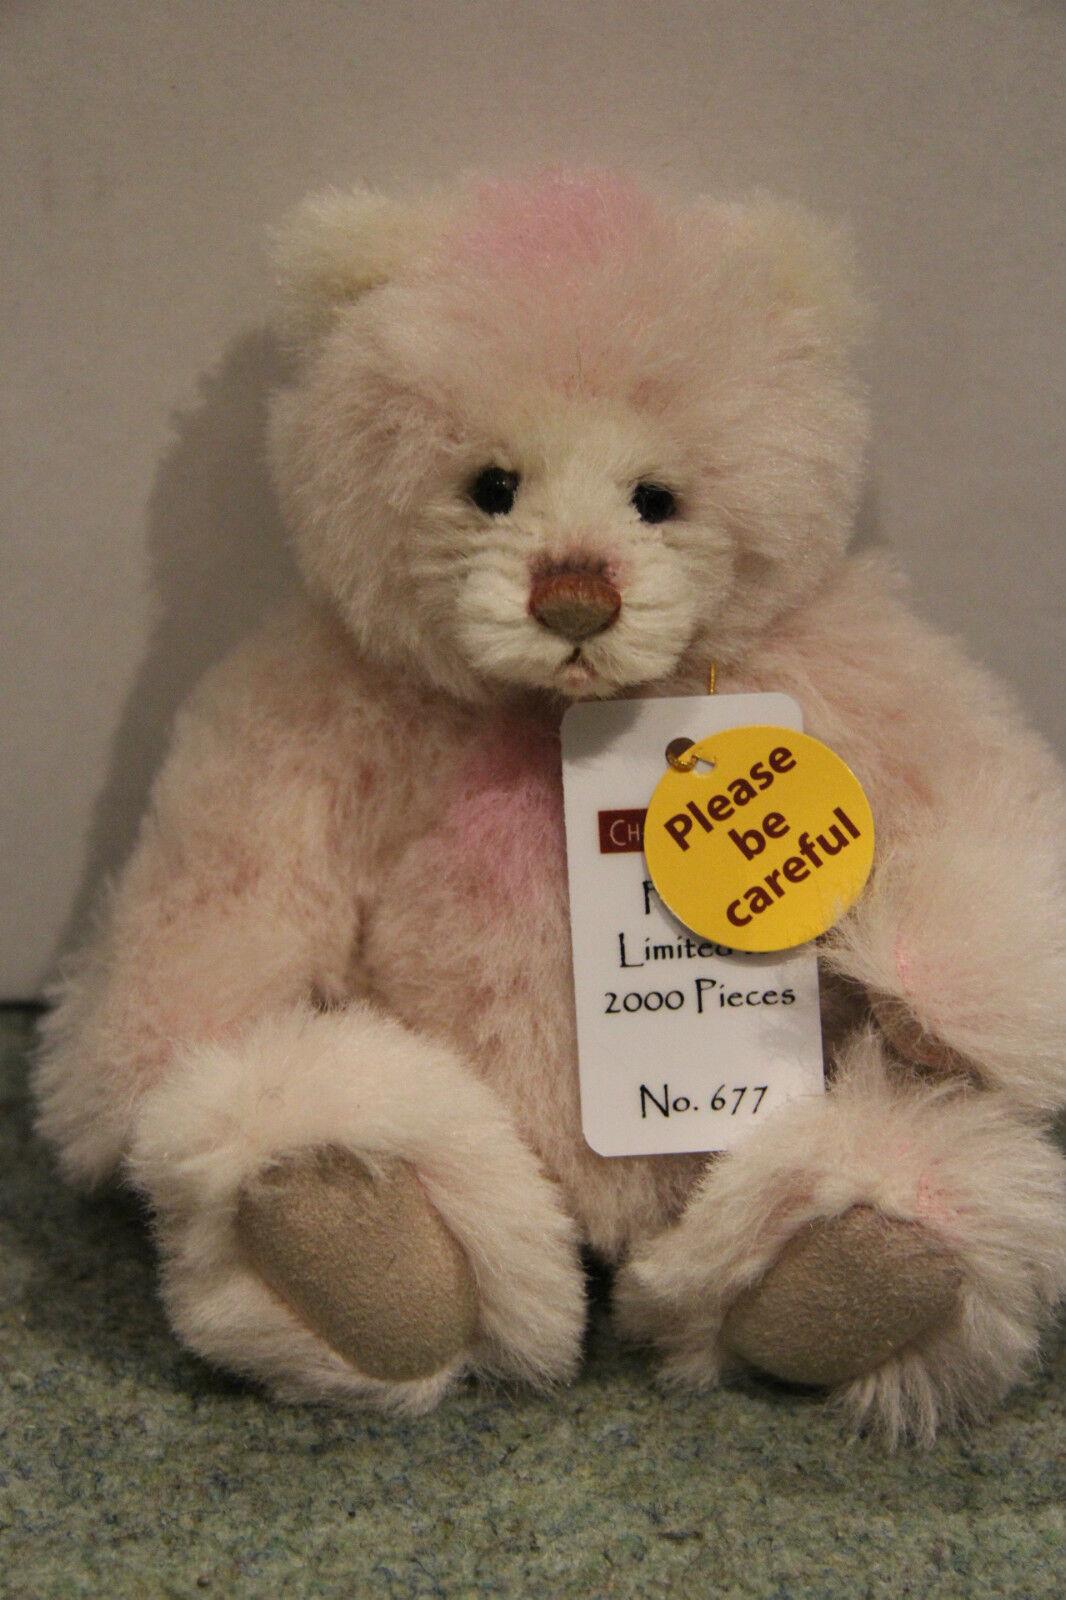 Charlie Charlie Charlie bears Flossy Minimo - NEU mit Etikett 6e3359